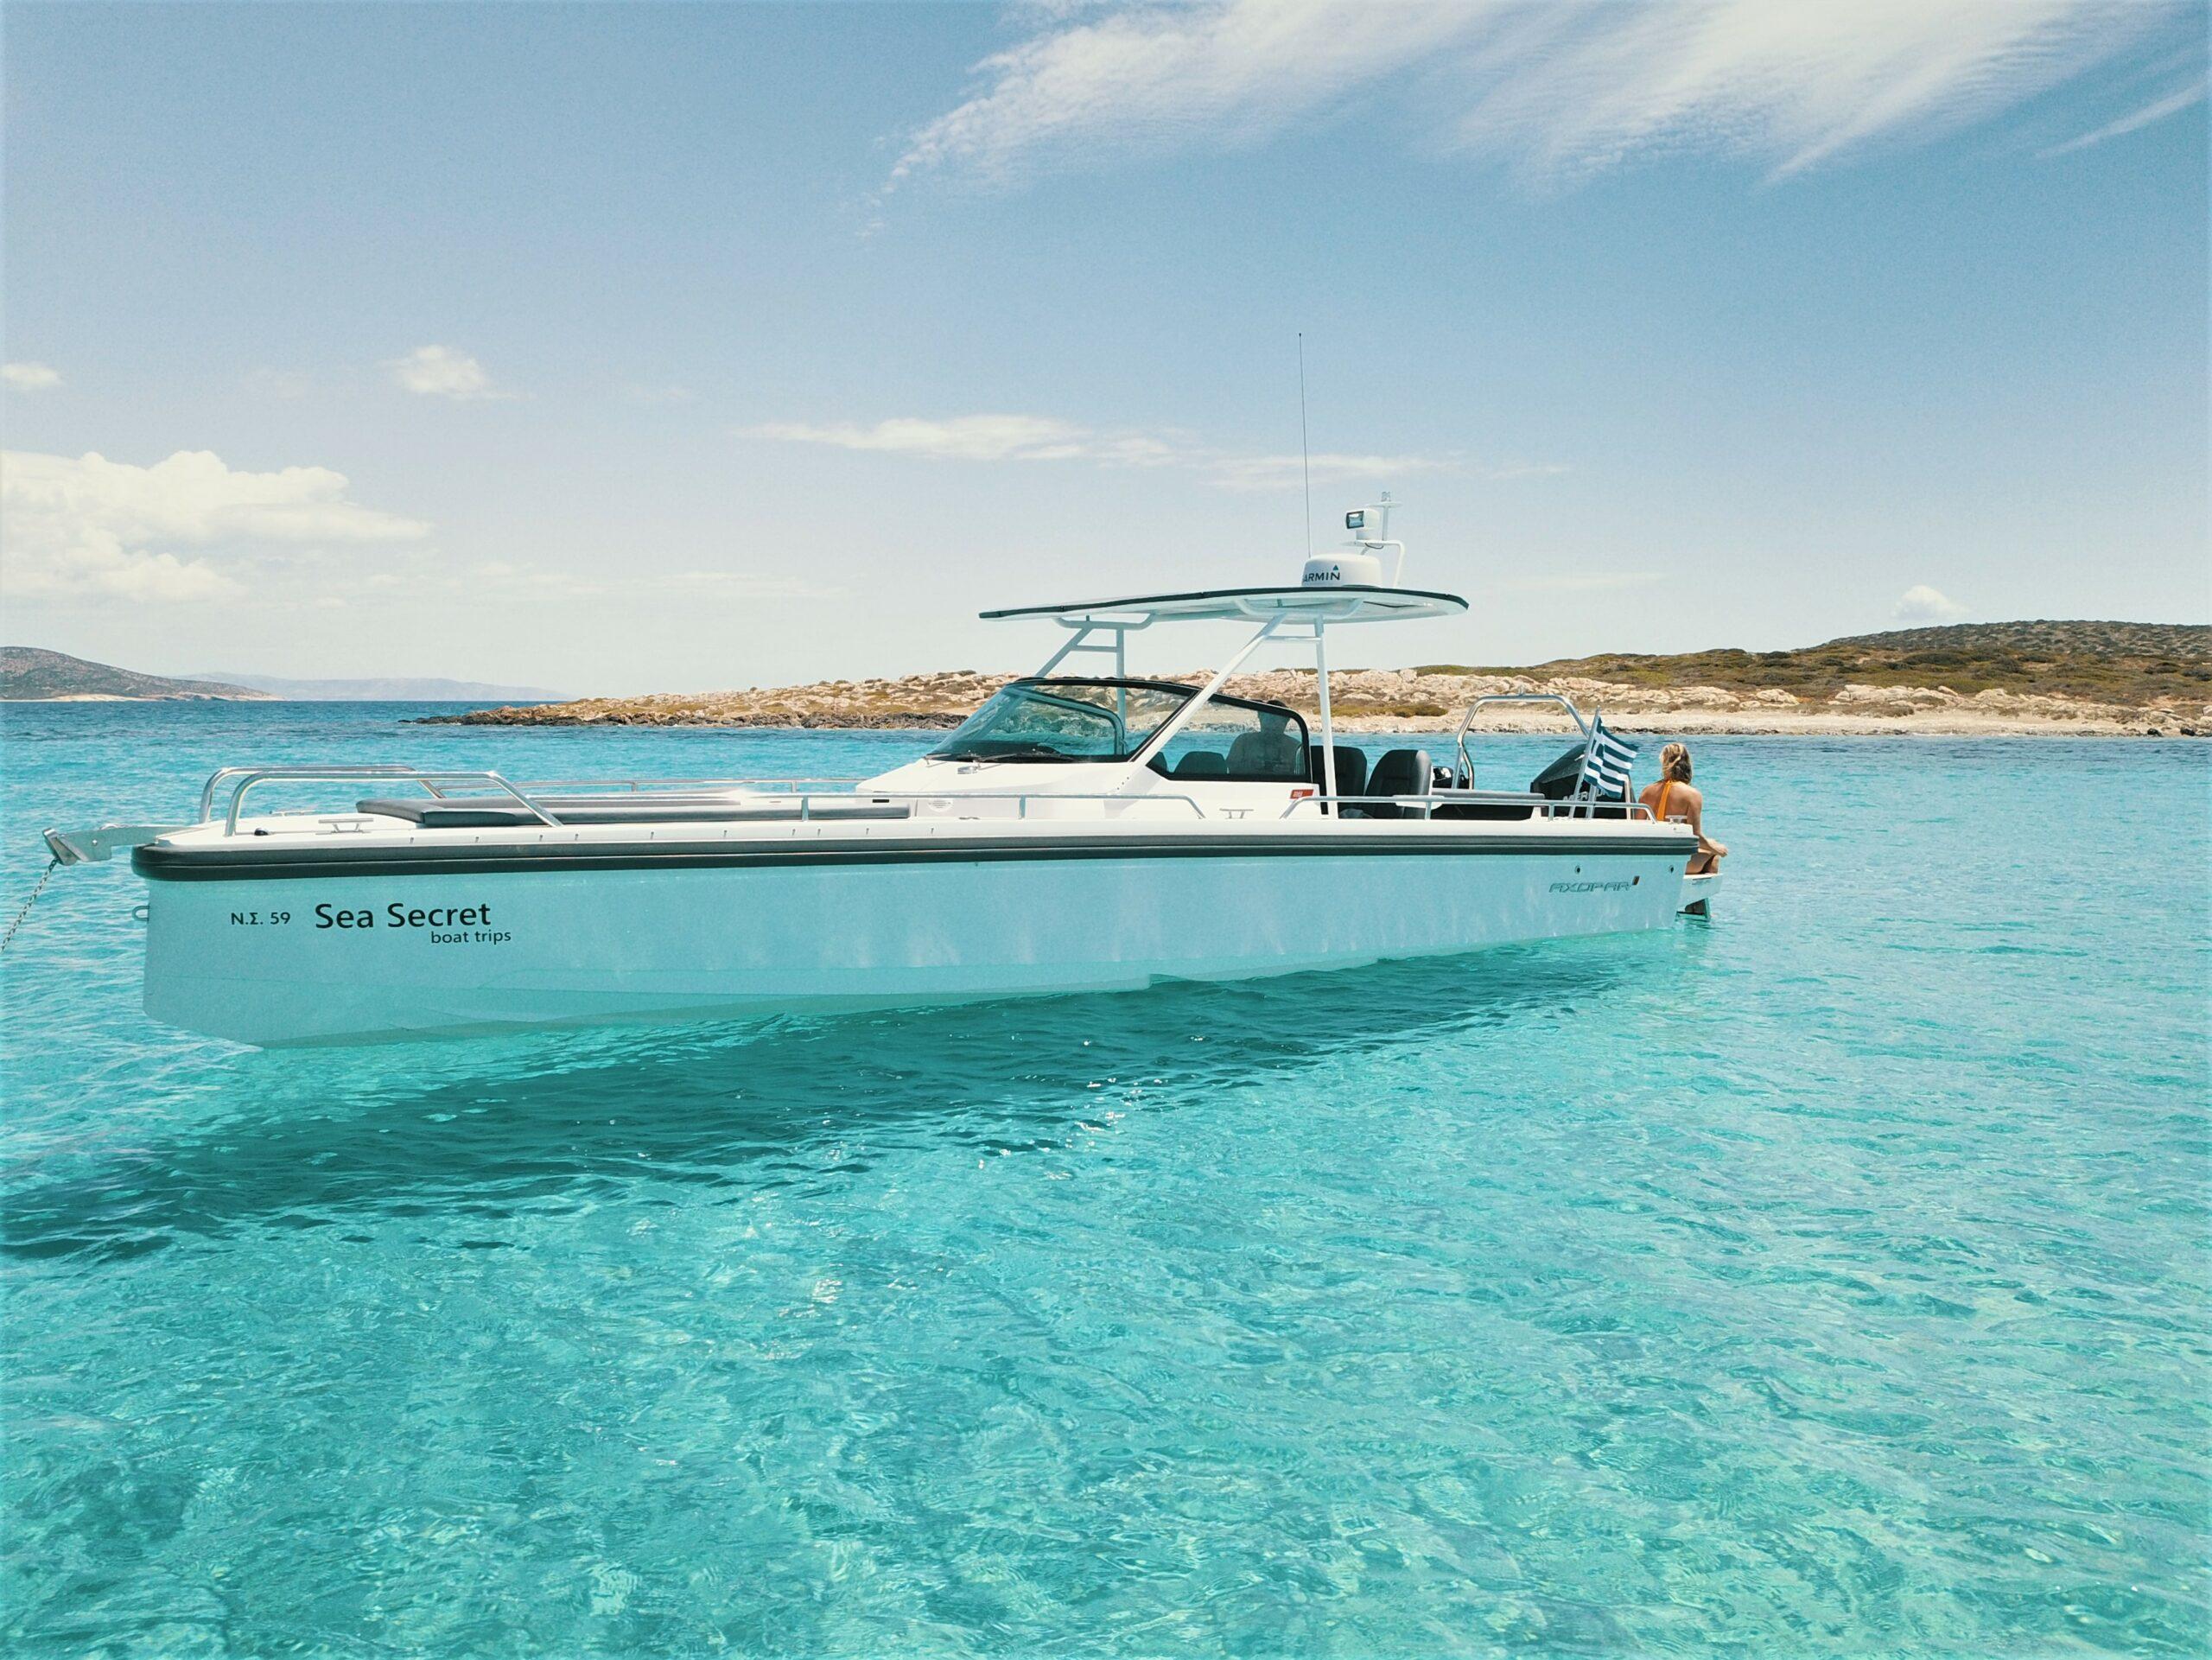 seasecret boat trips naos paros tigani private charter